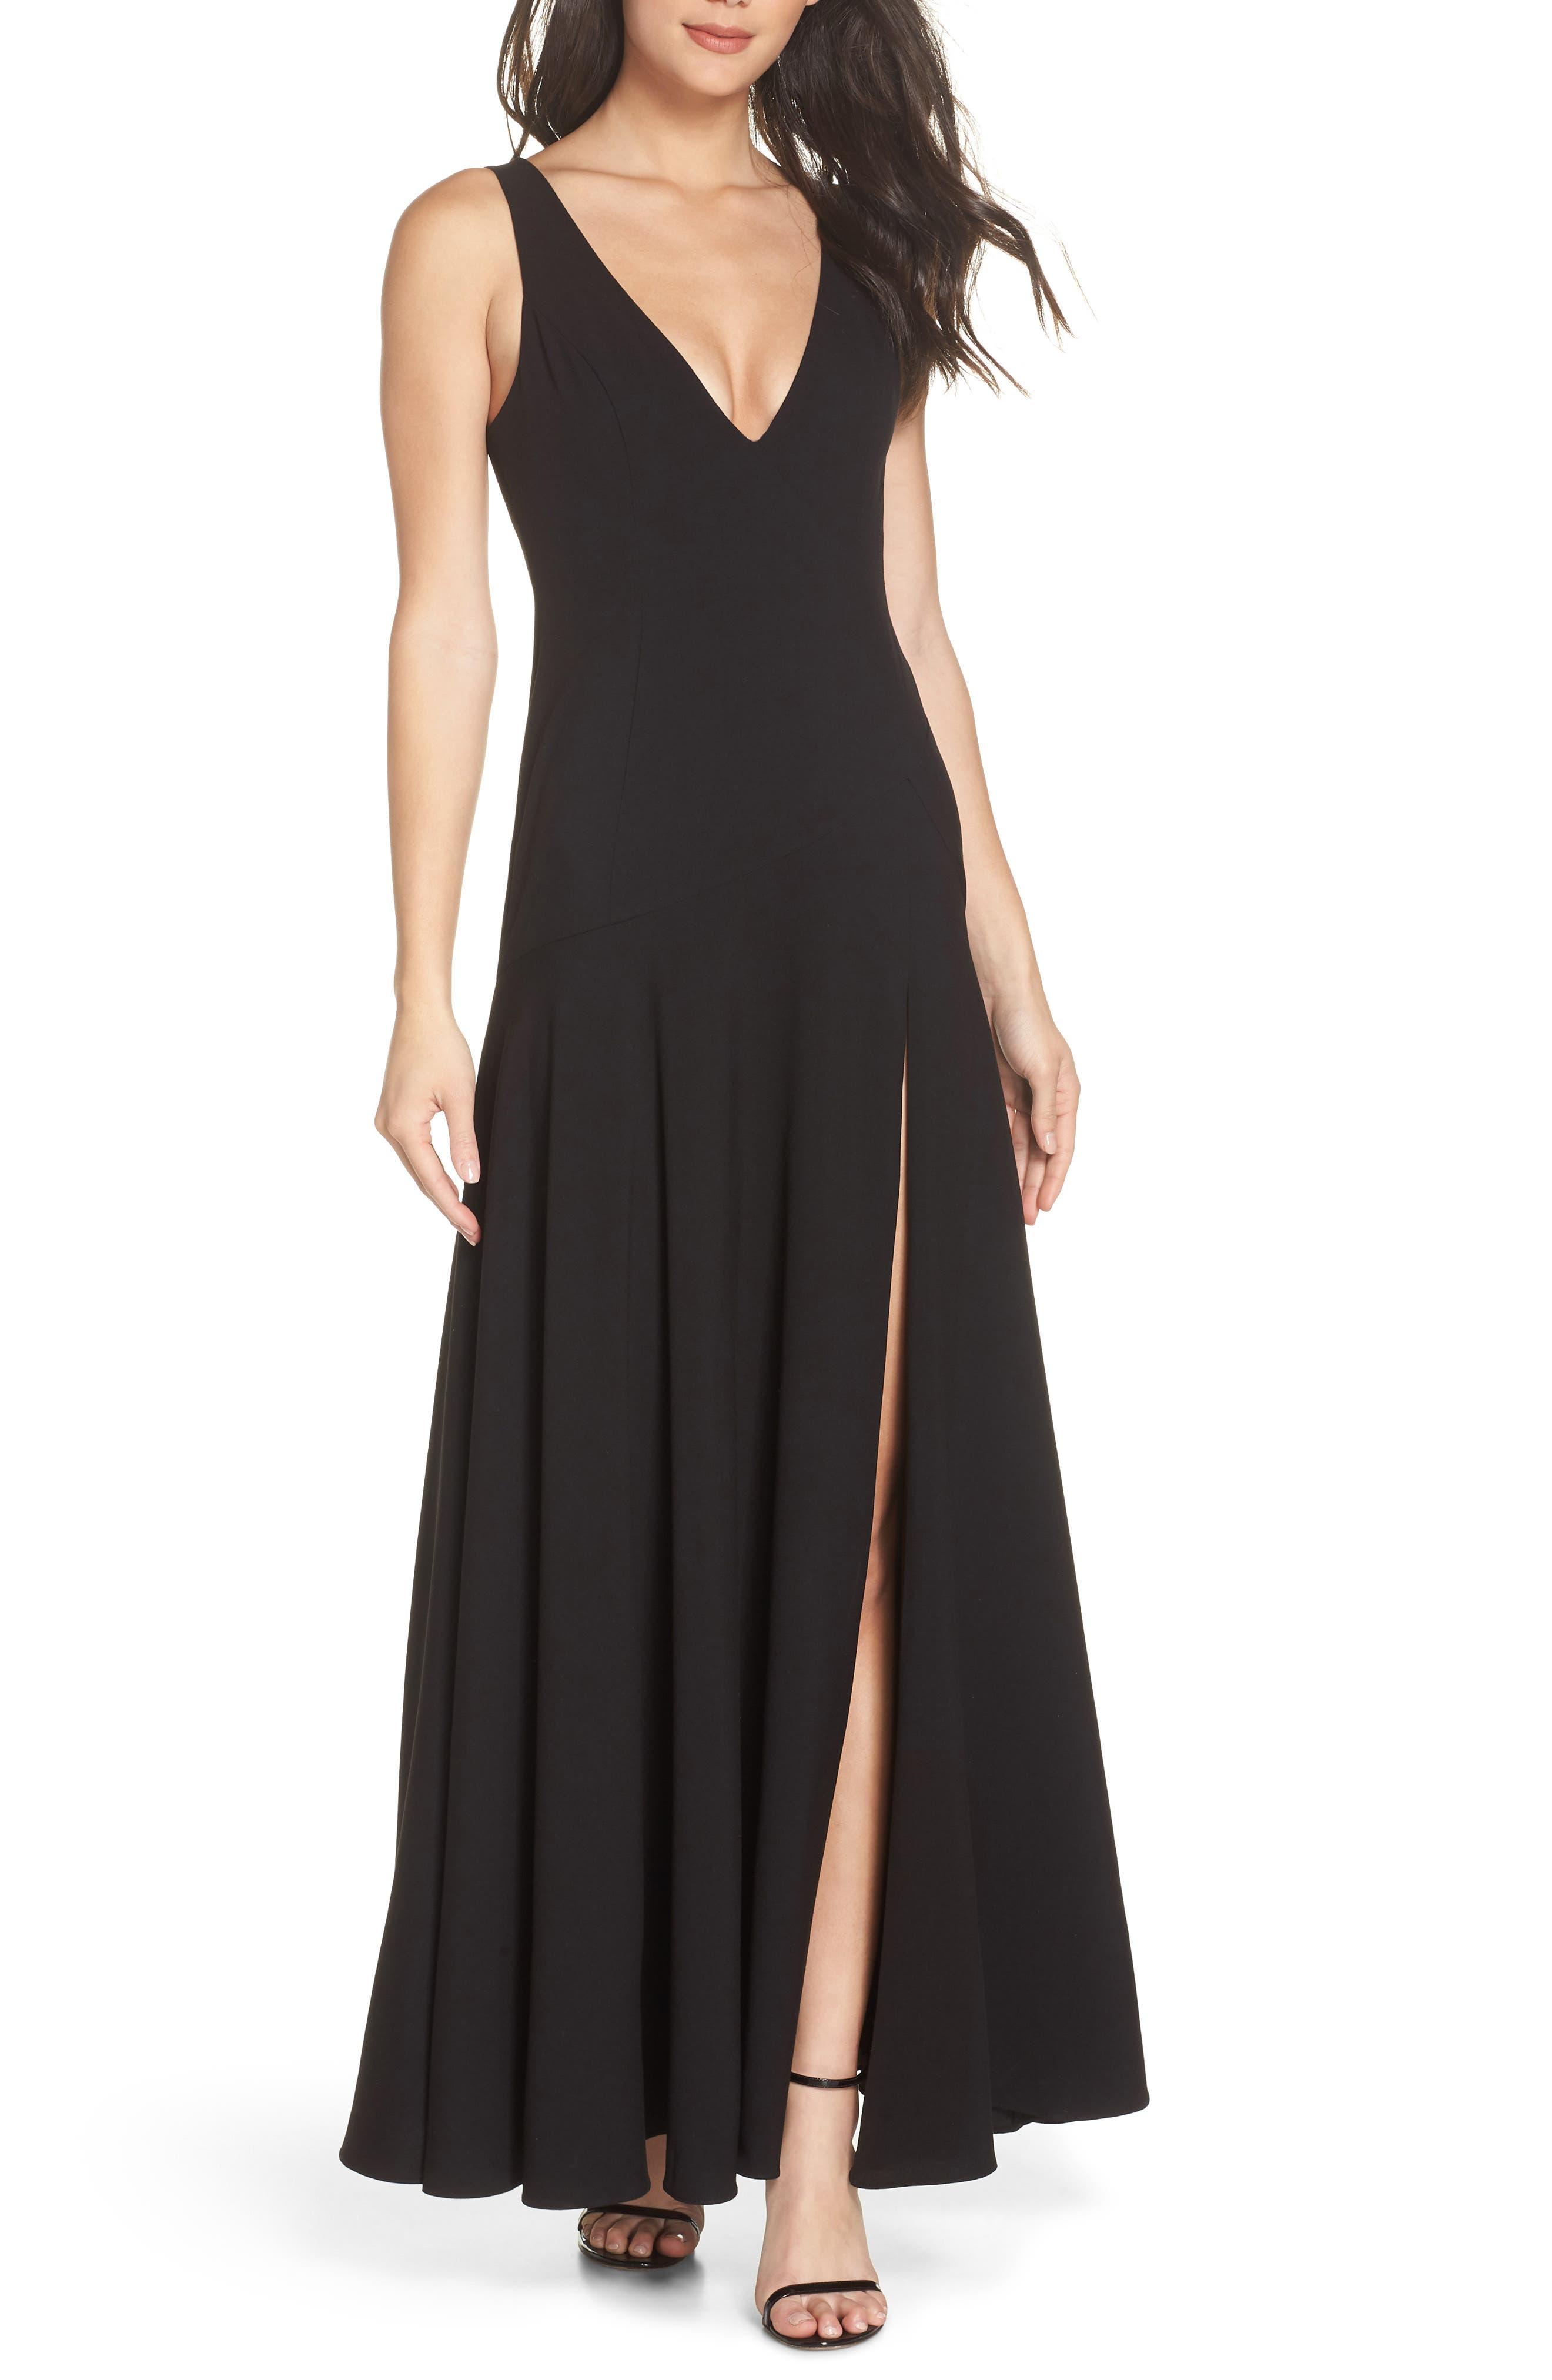 Fame & Partners The Hazel Front Slit Gown,                         Main,                         color, BLACK